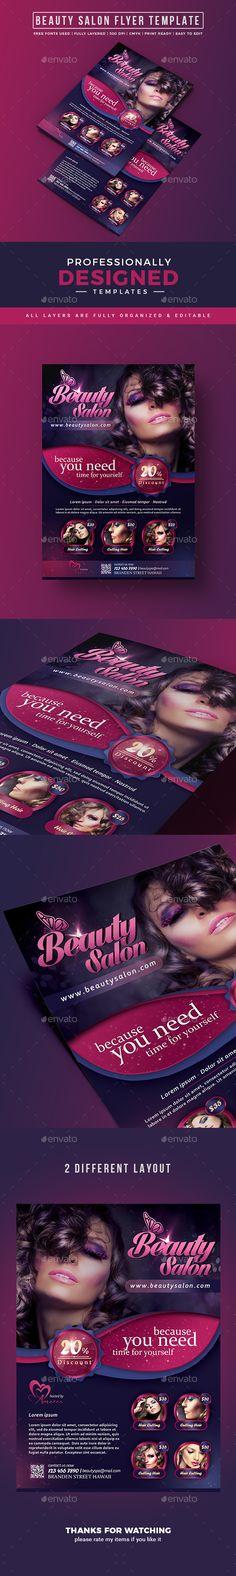 Beauty Salon Flyer Template Free Psd      Flyer